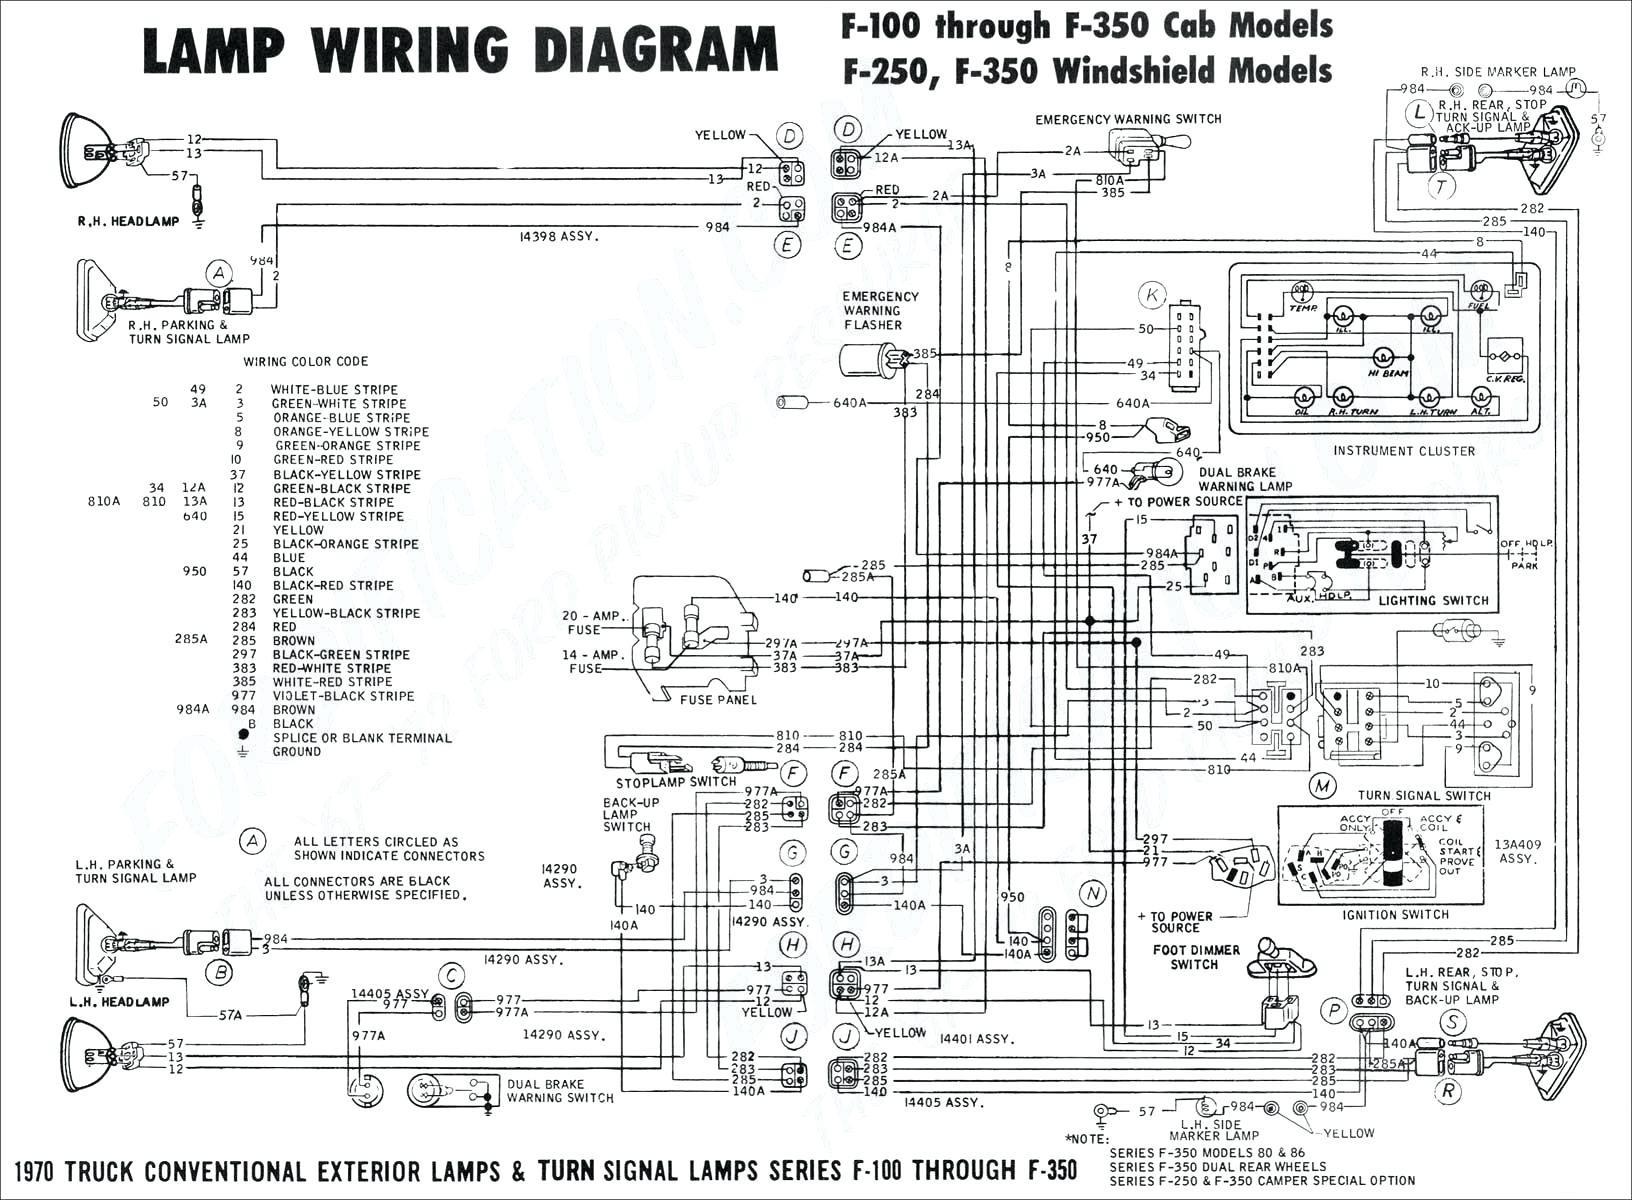 1994 Chevy Truck Brake Light Wiring Diag - Panoramabypatysesma - 1994 Chevy Truck Brake Light Wiring Diagram